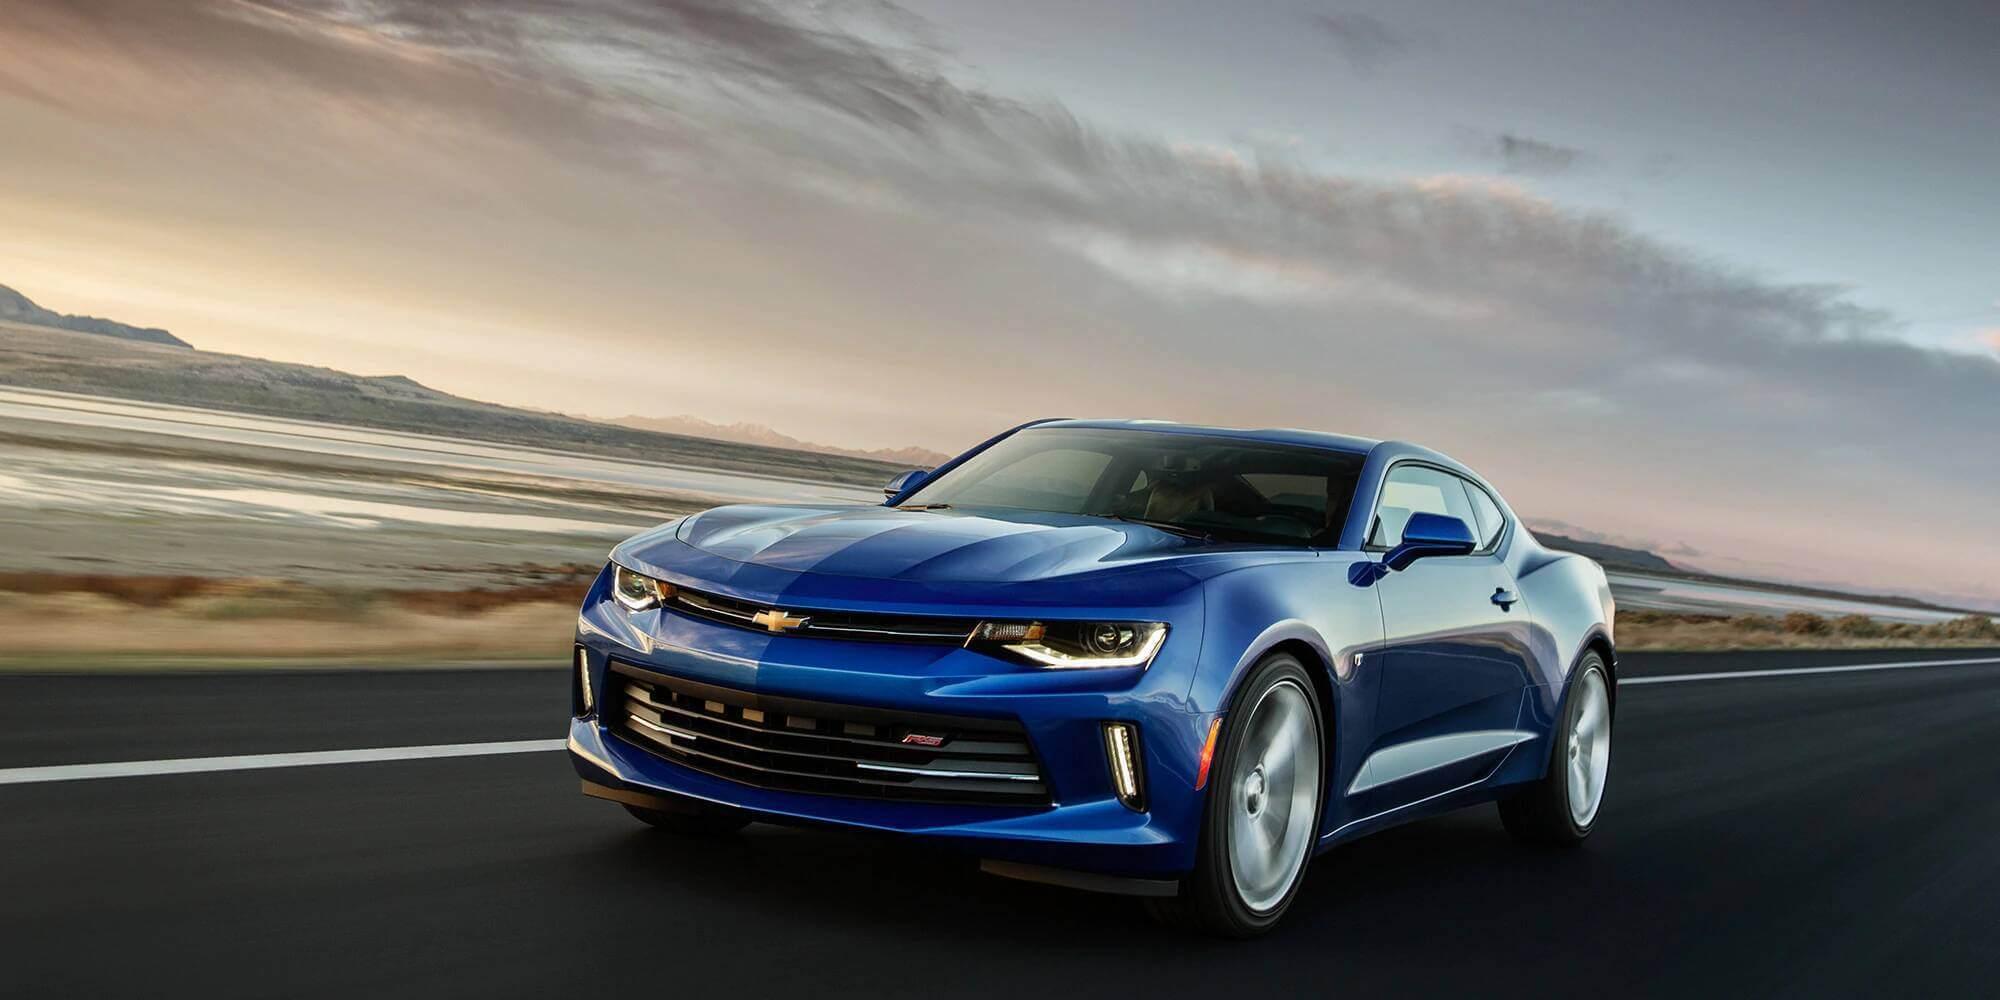 Camaro Ss Lease >> Chevrolet Camaro Lease Deals Price Cincinnati Oh